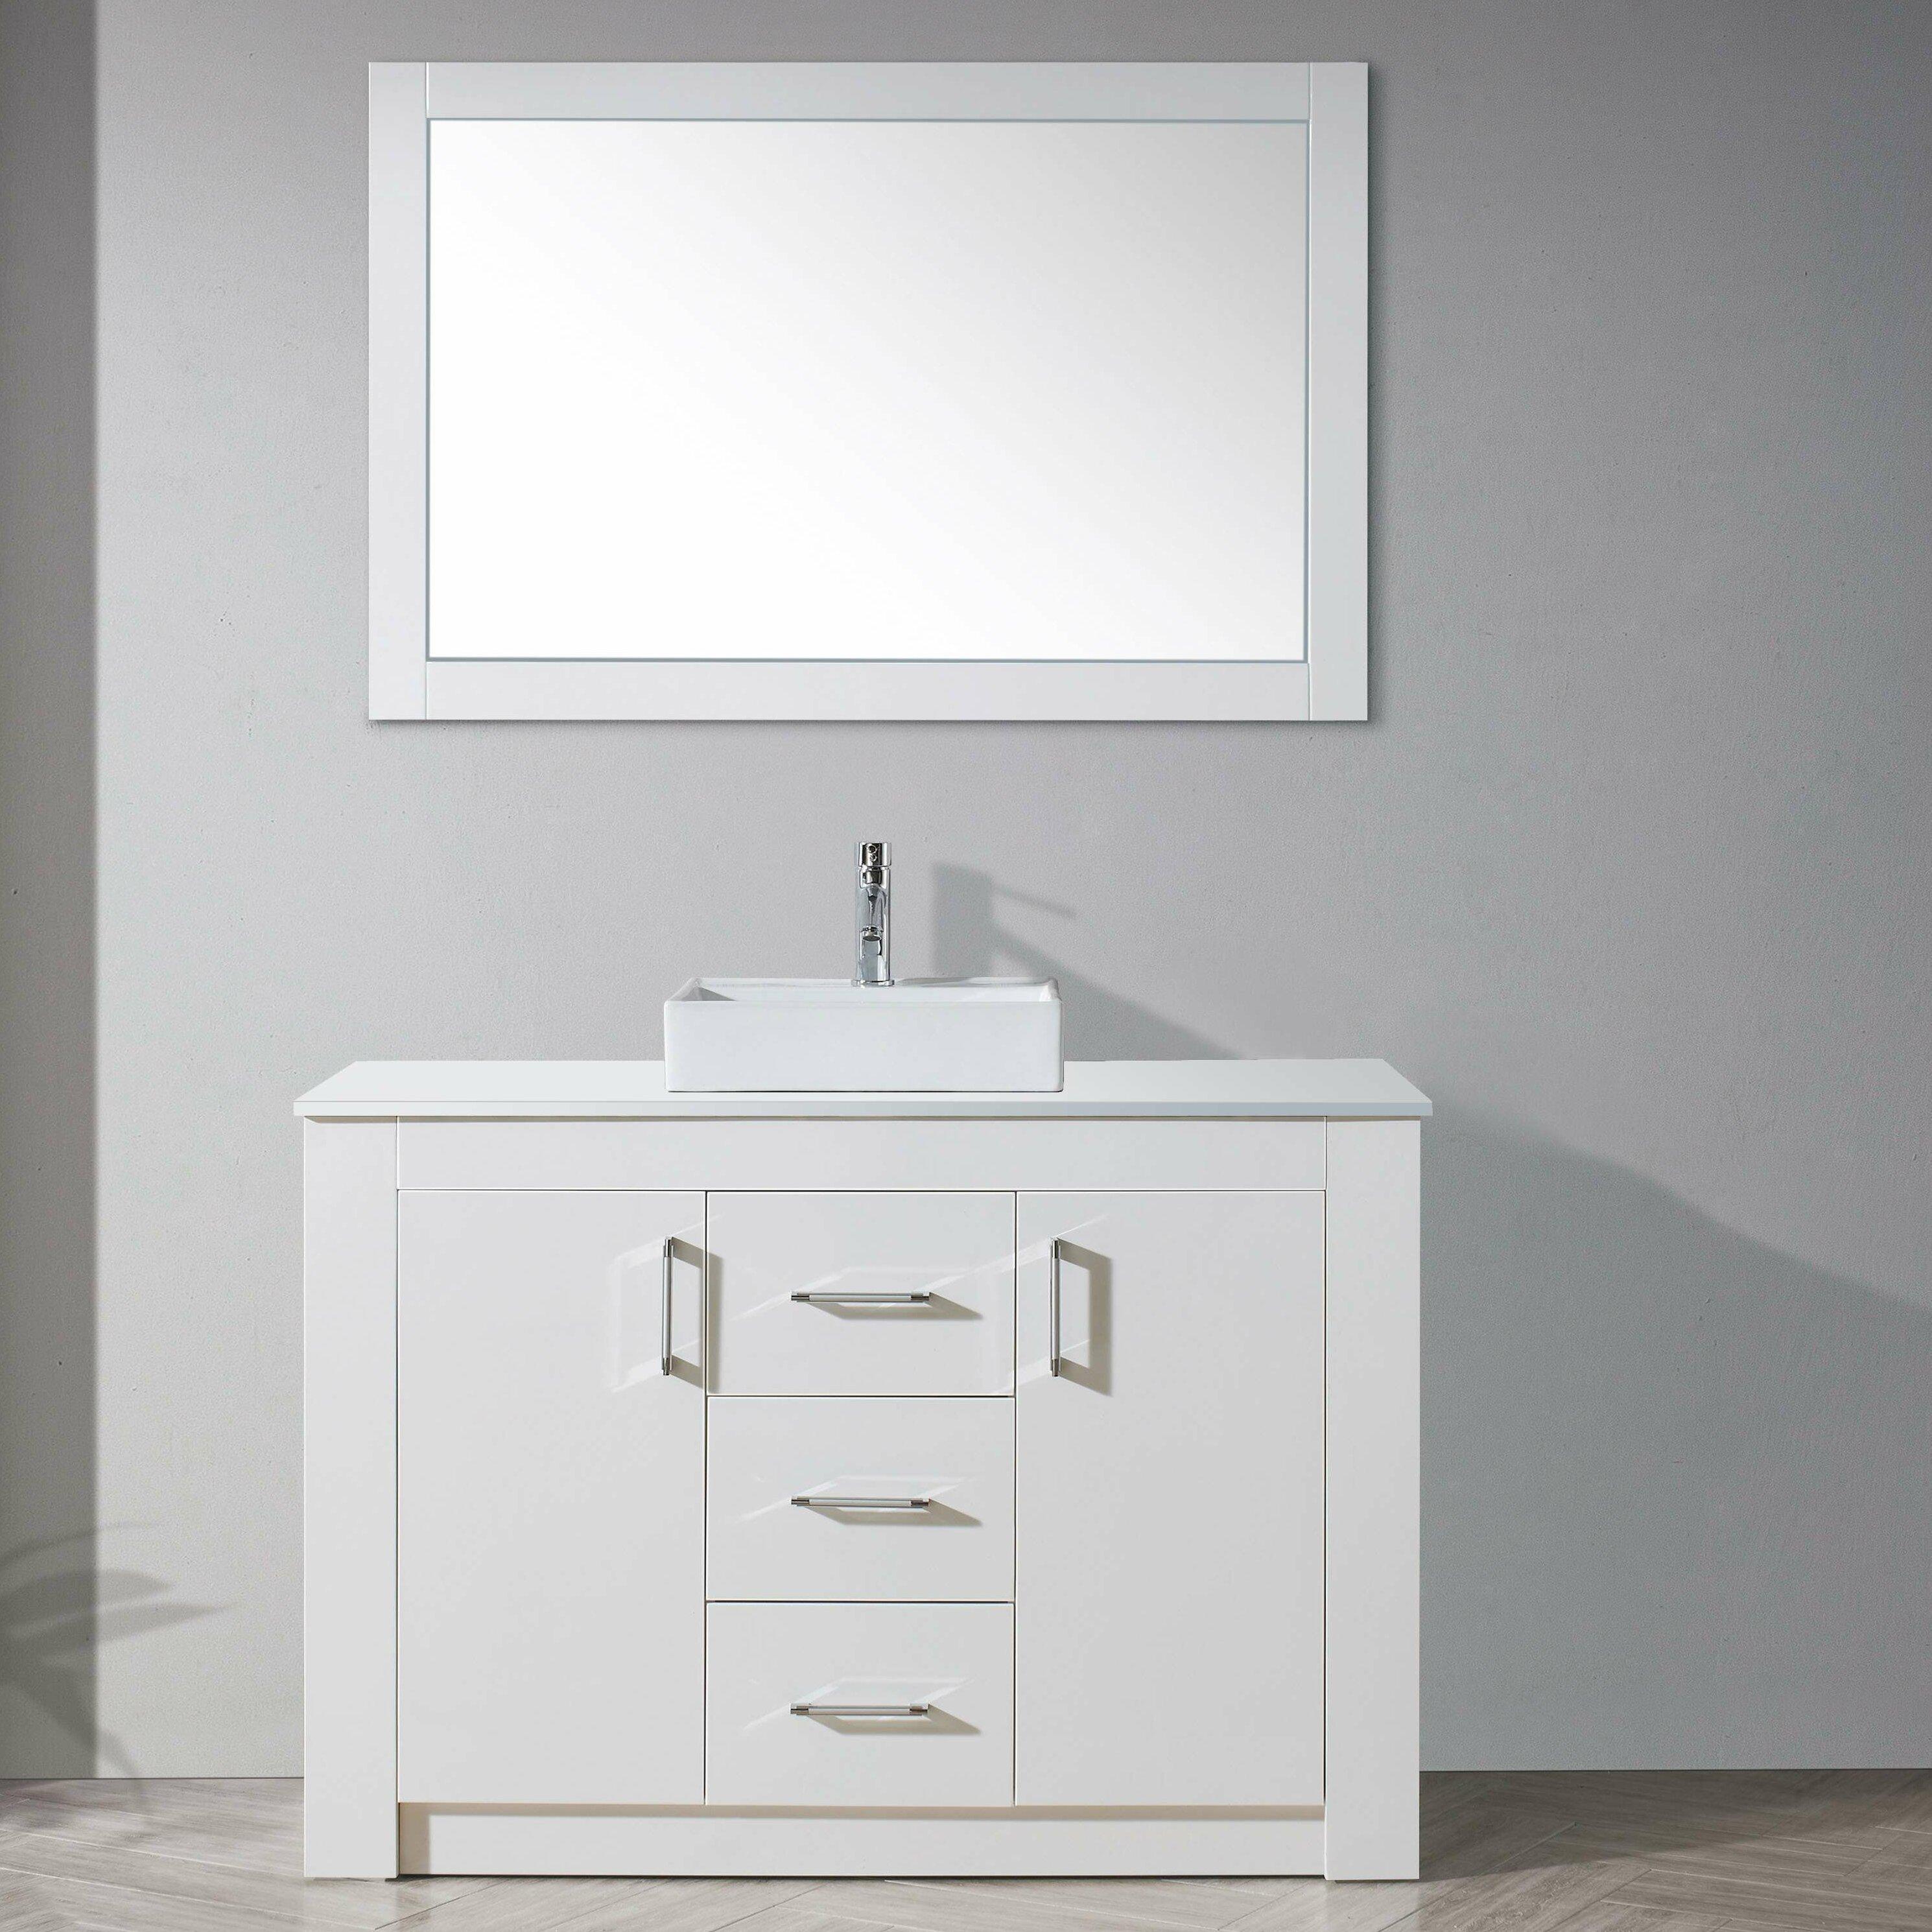 Virtu tavian 48 single bathroom vanity set with stone and for Vanity and mirror set